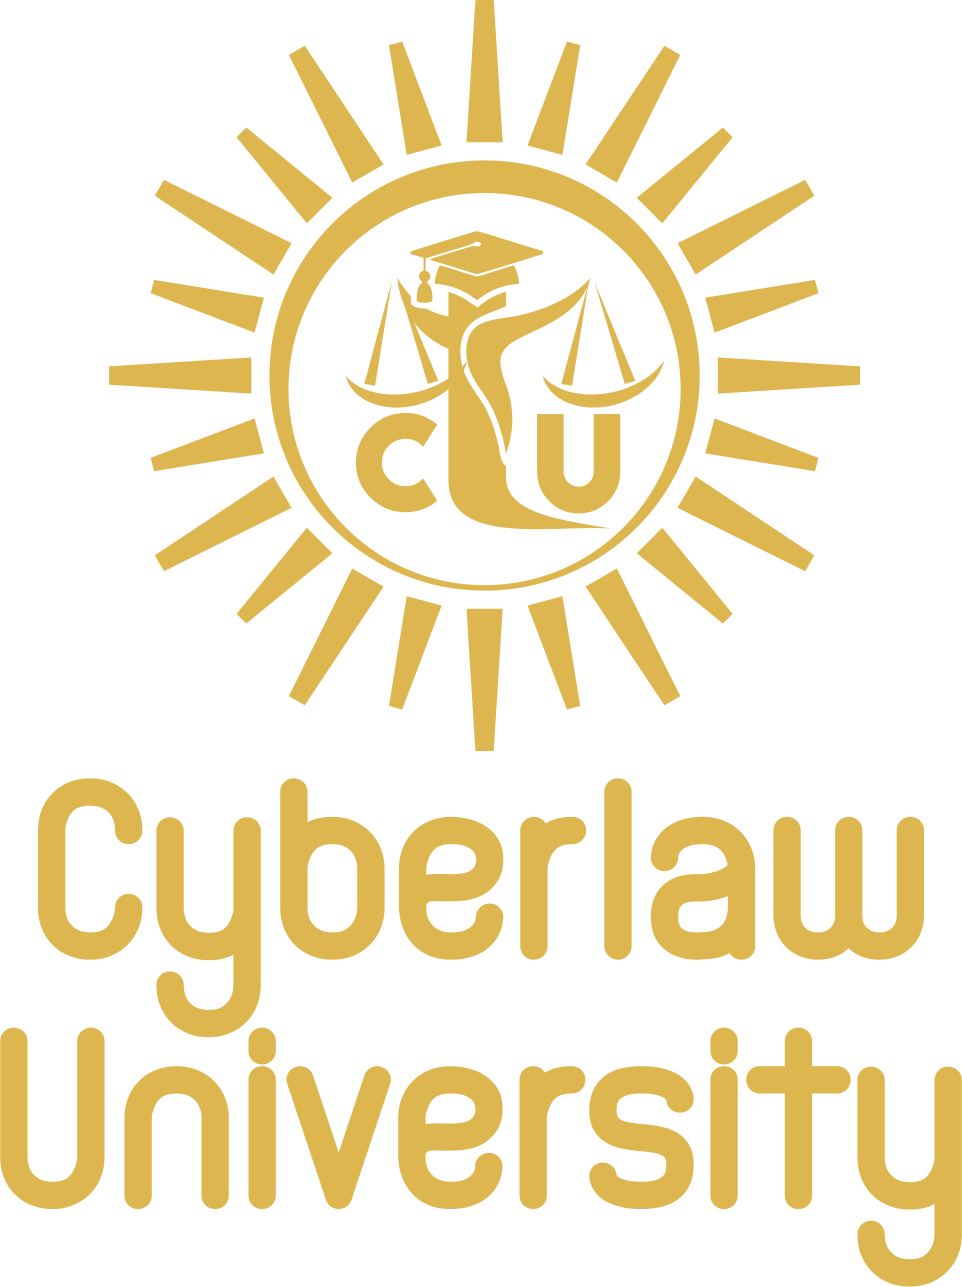 Cyberlaw University